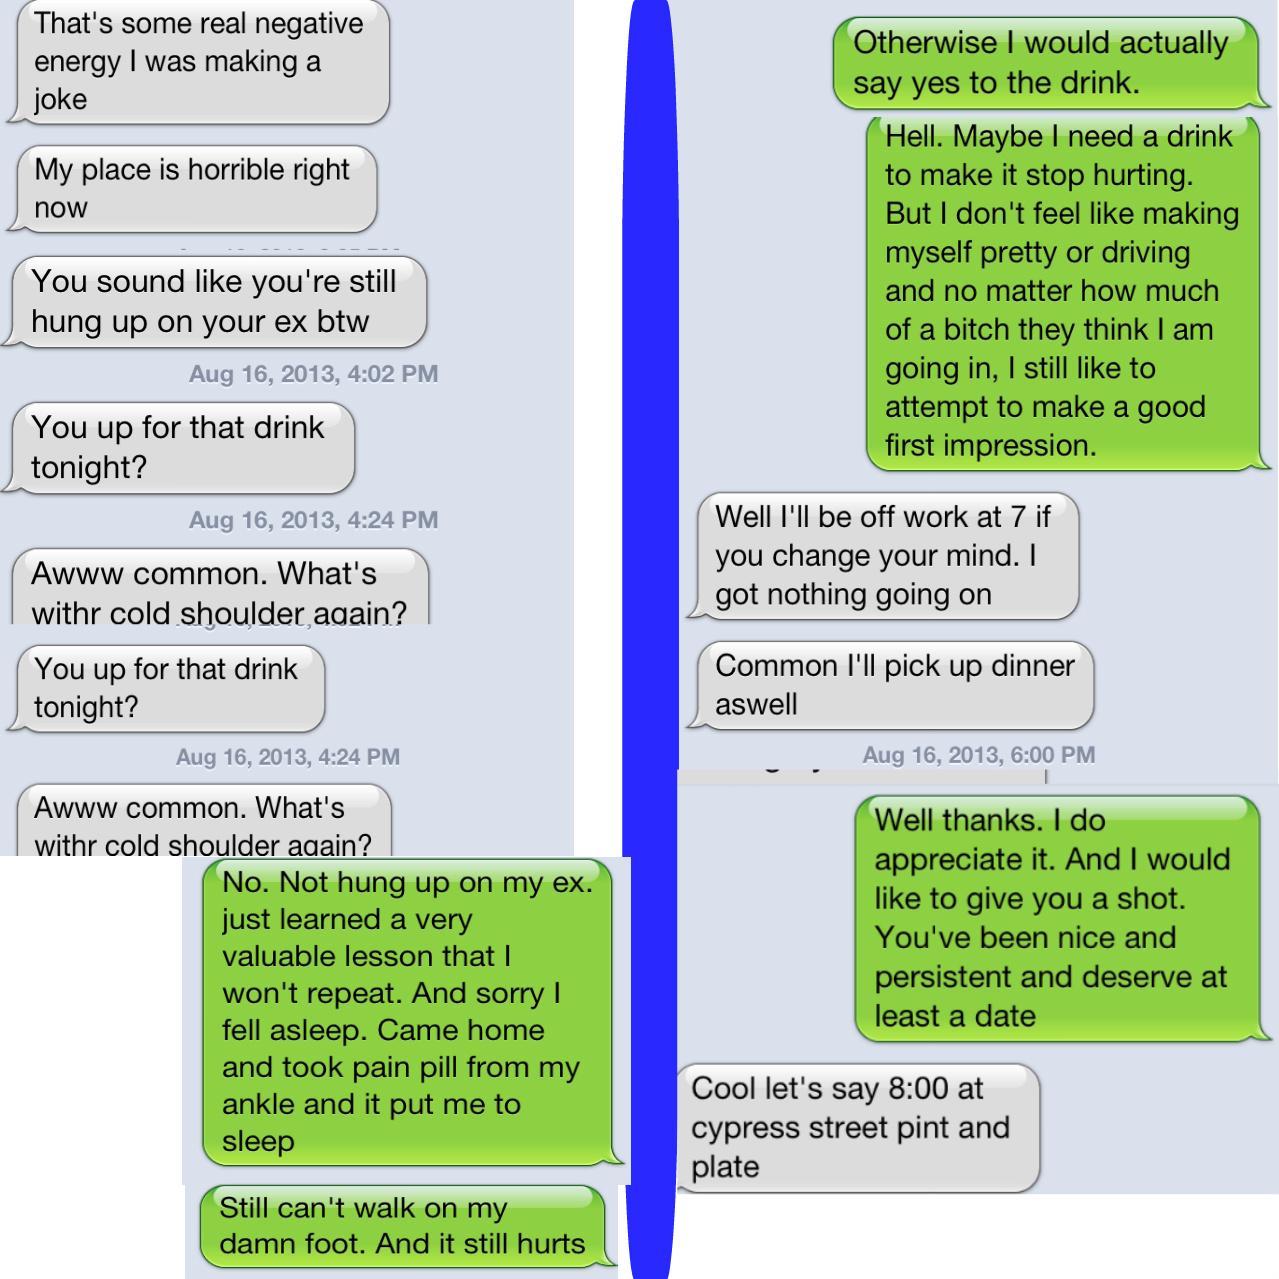 Guy online being too pushy - GirlsAskGuys